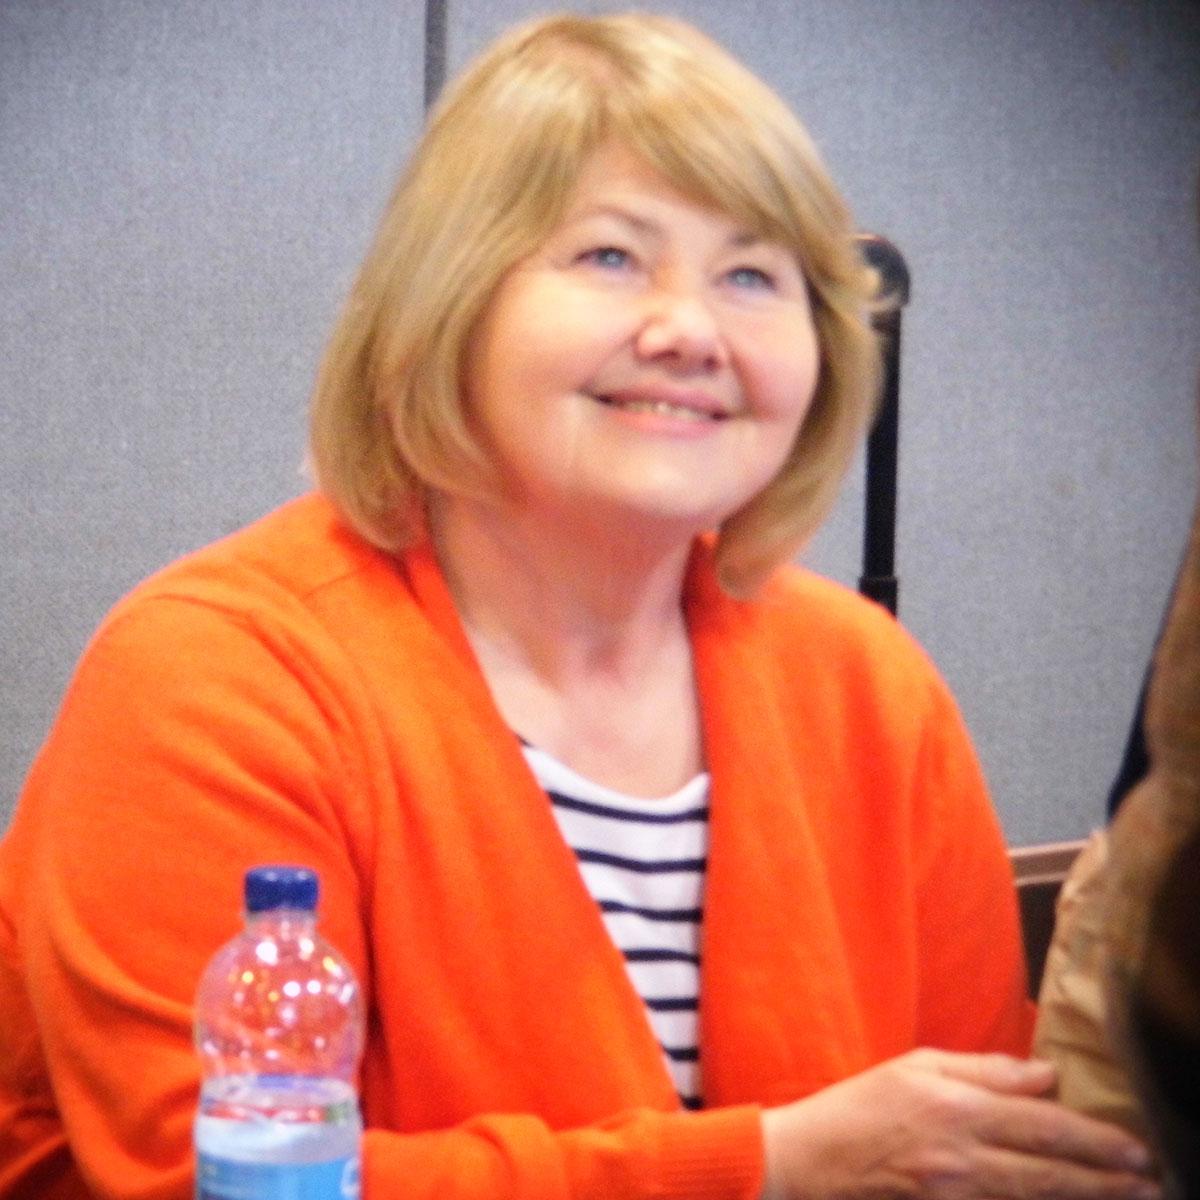 Annette Badland Annette Badland new pictures